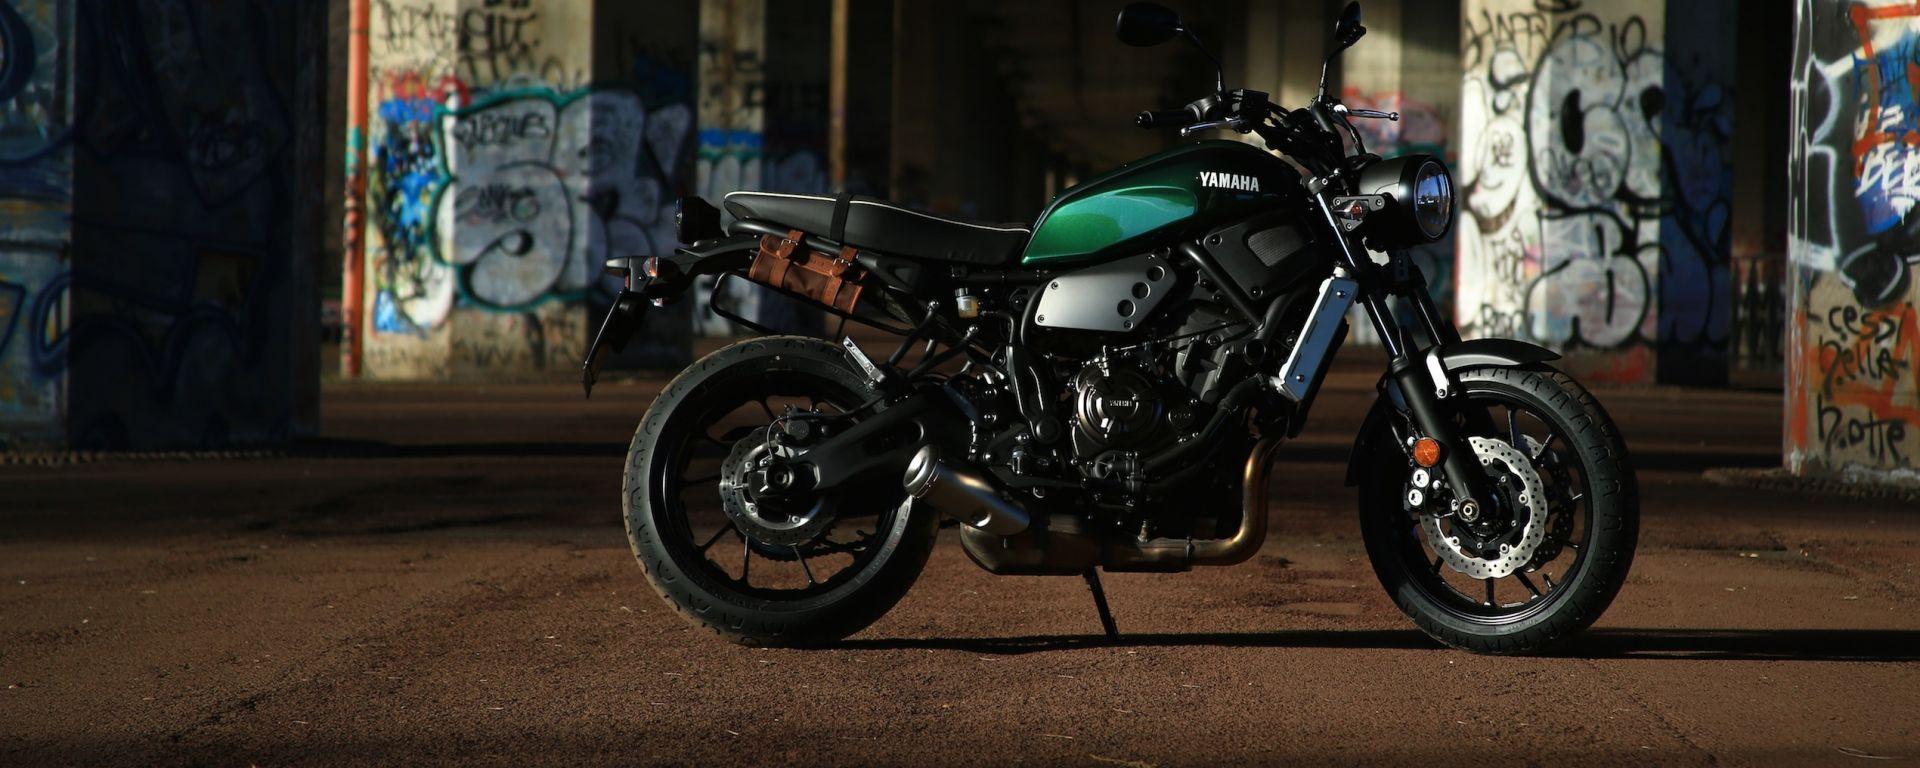 Yamaha XSR700: giorno 3